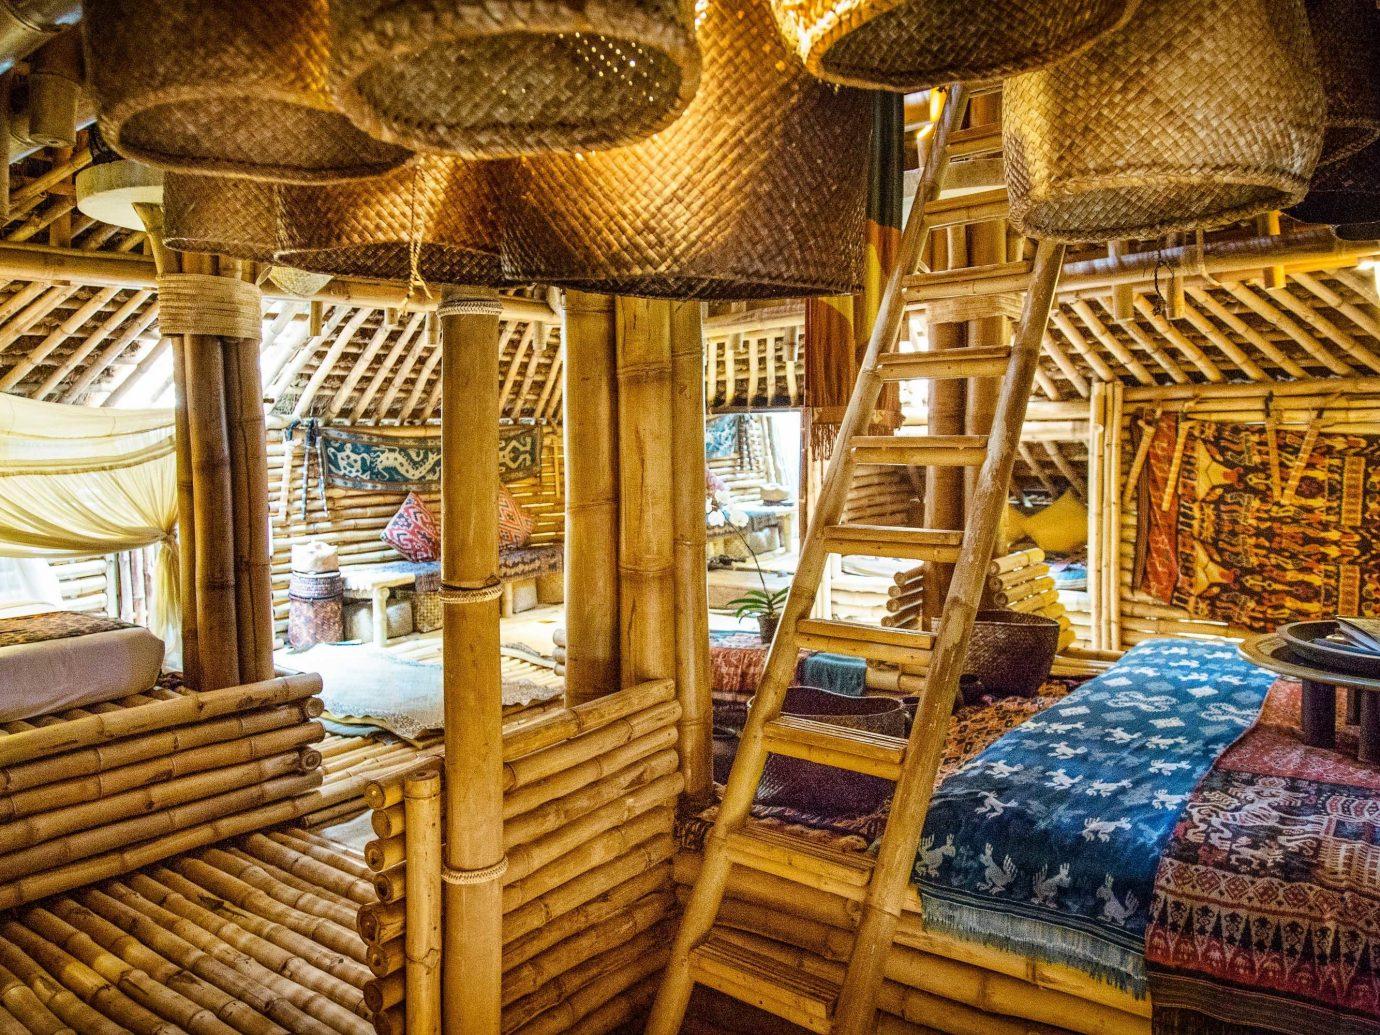 Boutique Hotels Hotels chair wood interior design log cabin furniture